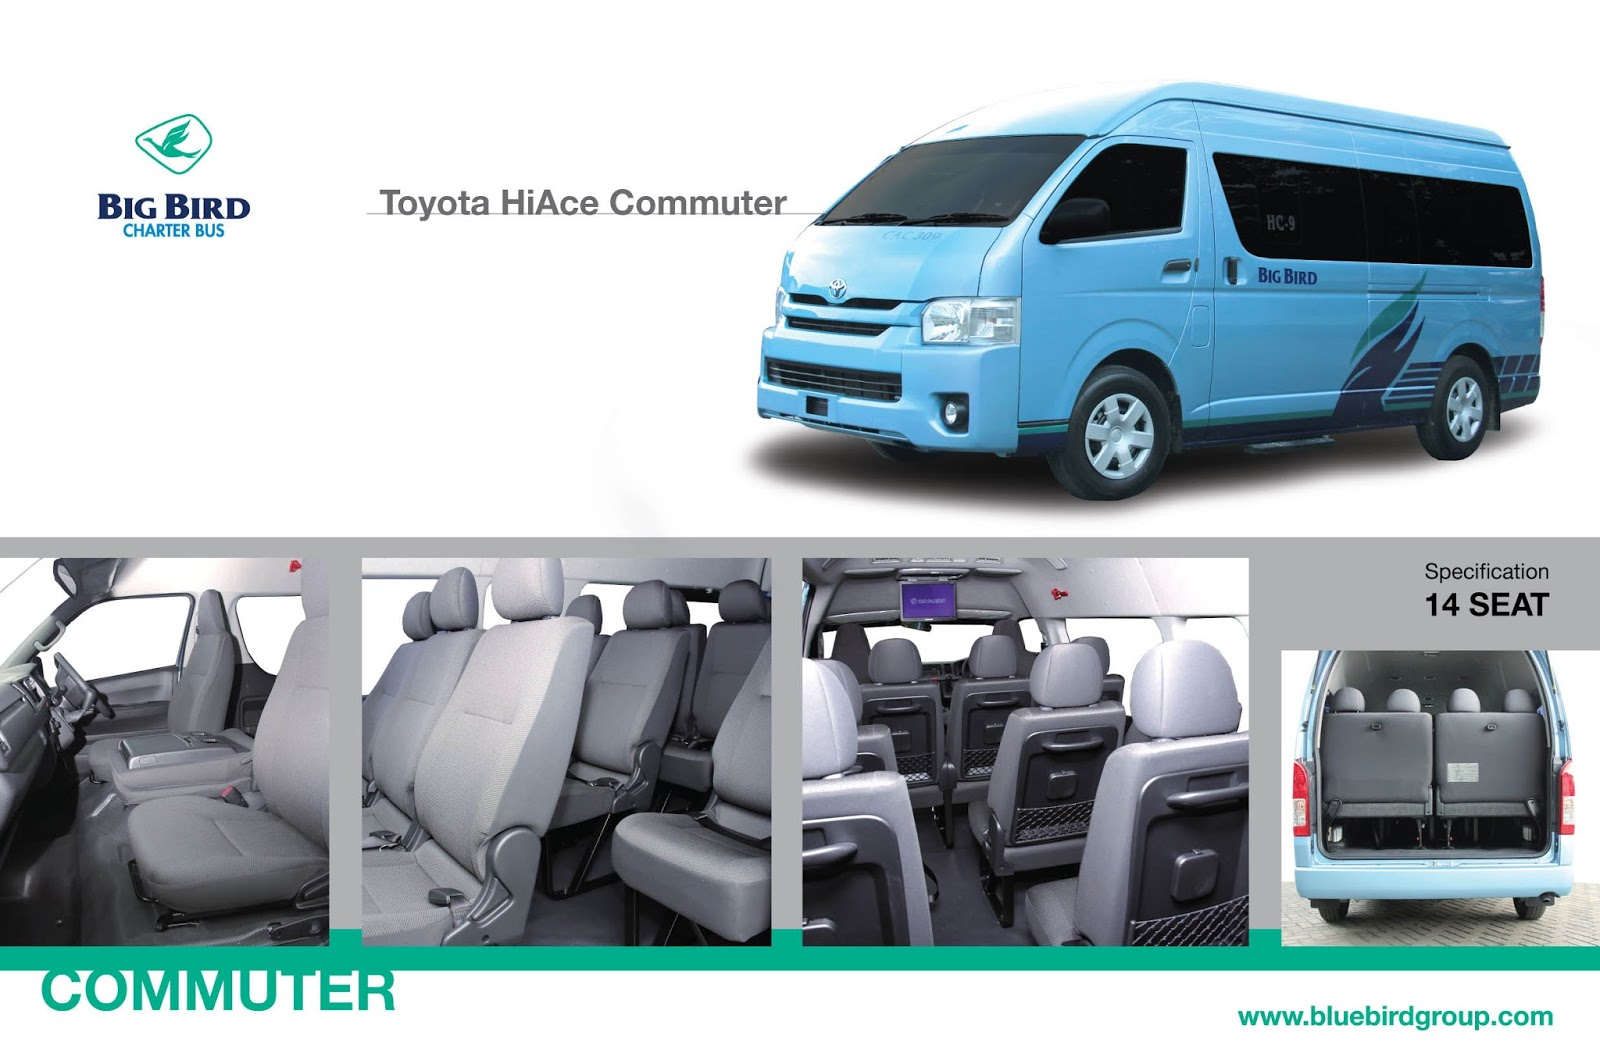 Sewa HI Ace Commuter Blue Bird - Sewa Elf Jakarta | Sewa ...